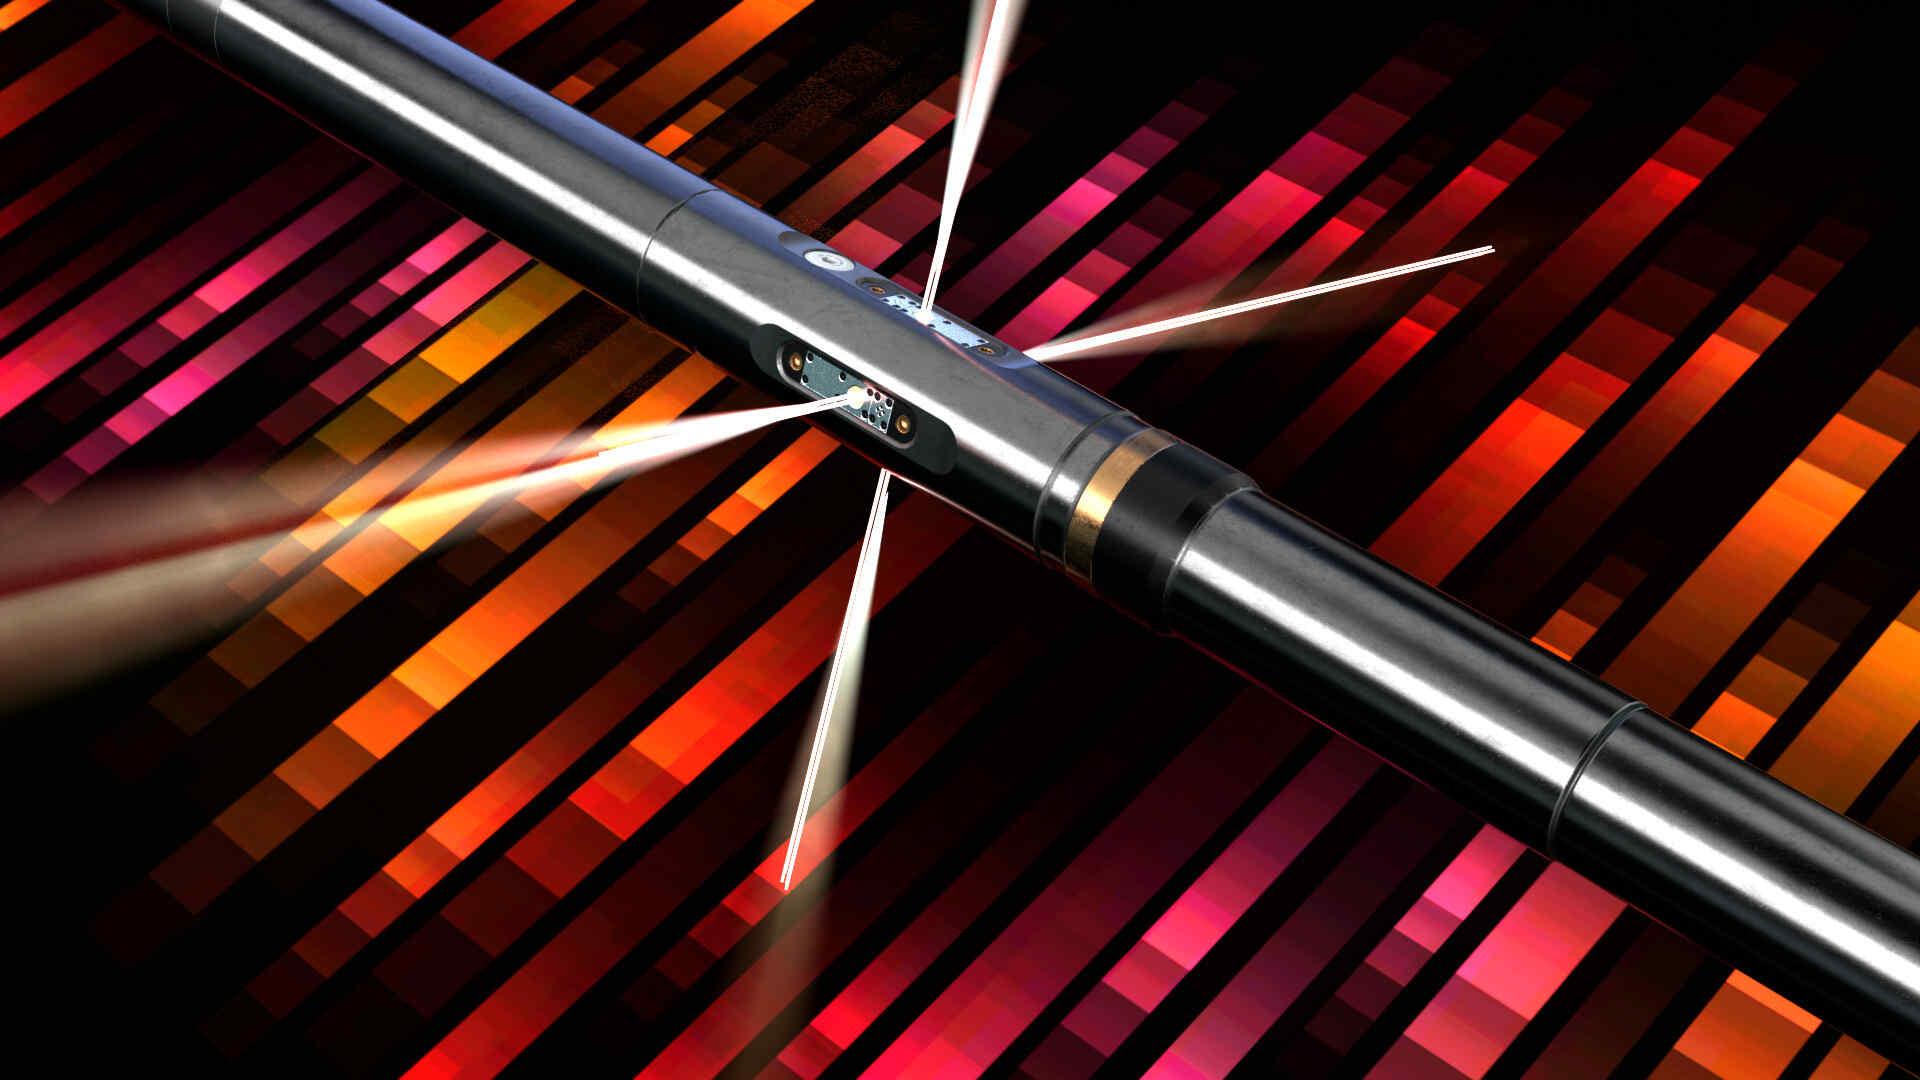 PixStar™ High Resolution Ultrasonic Imaging Service